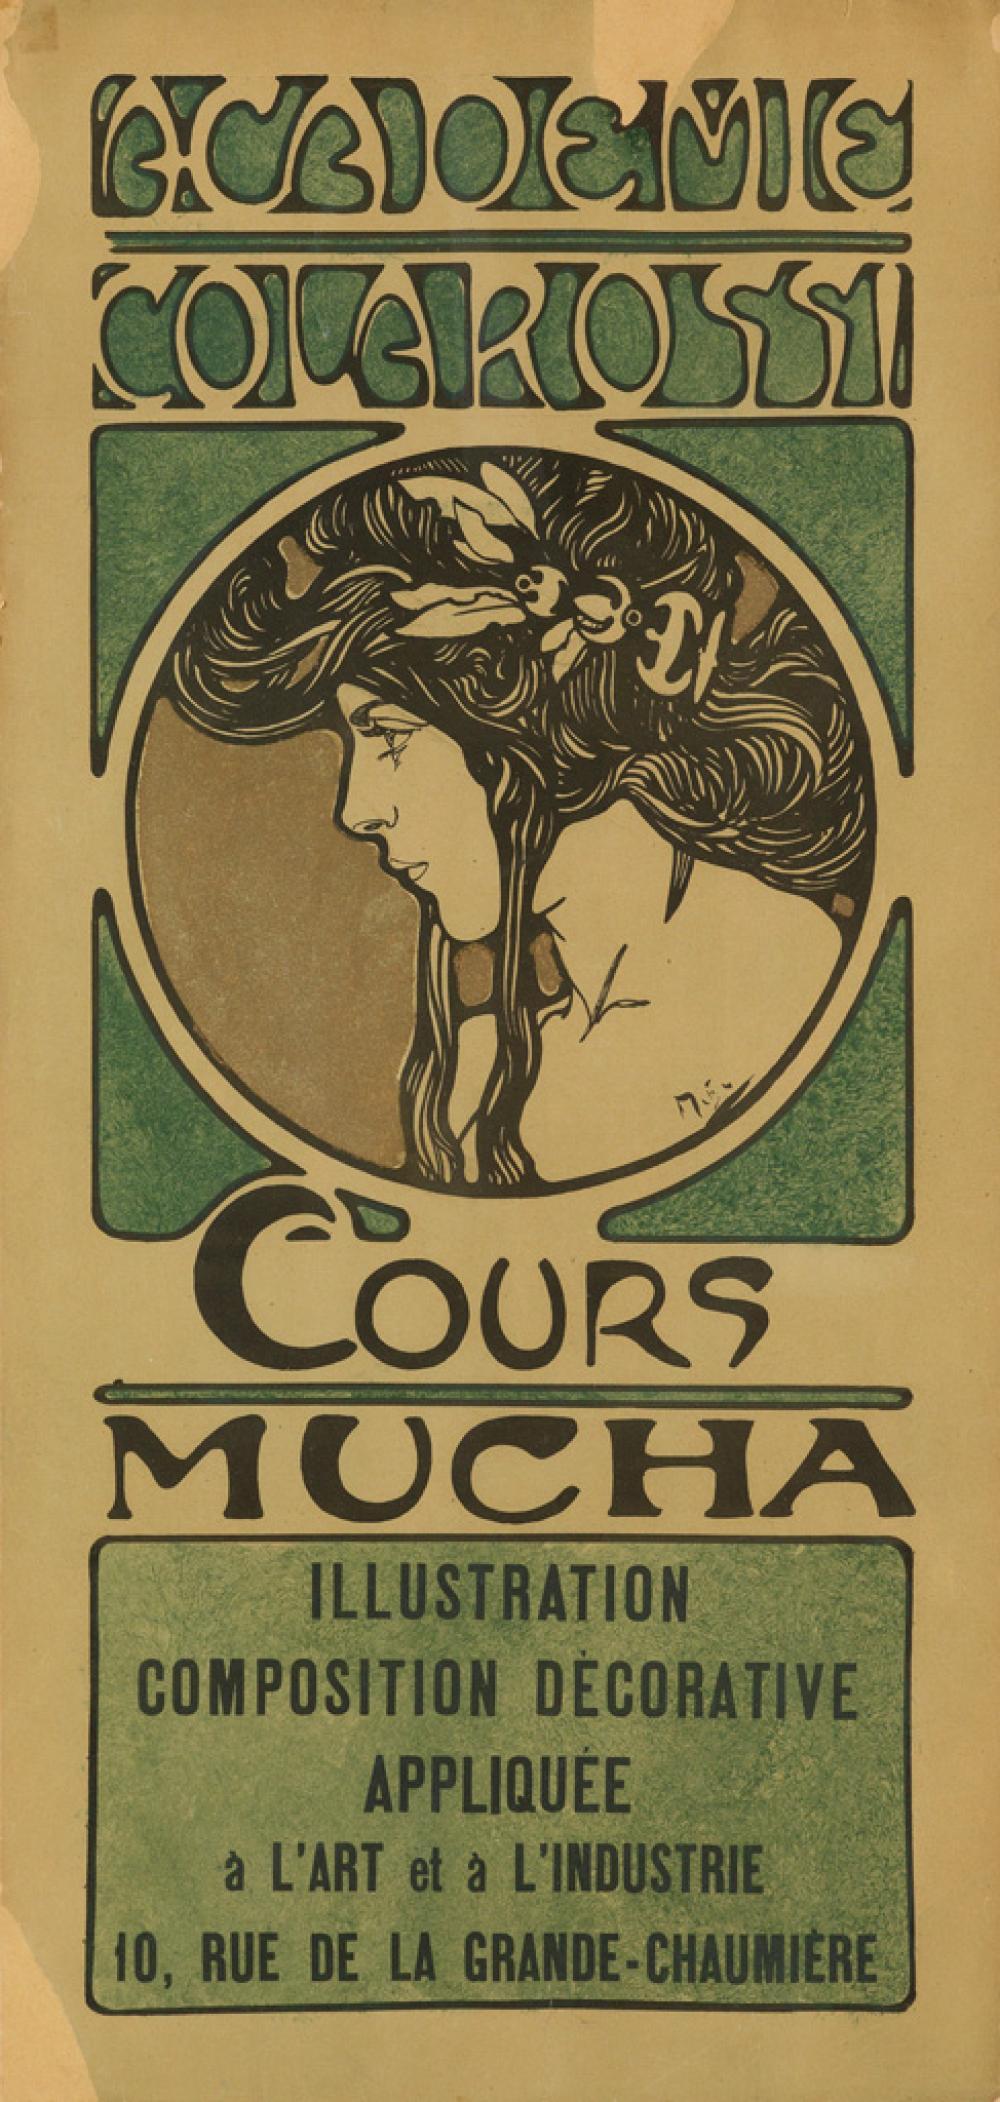 ALPHONSE MUCHA (1860-1939). ACADEMIE COLAROSSI / COURS MUCHA. 1900. 27x13 inches, 69x33 cm.